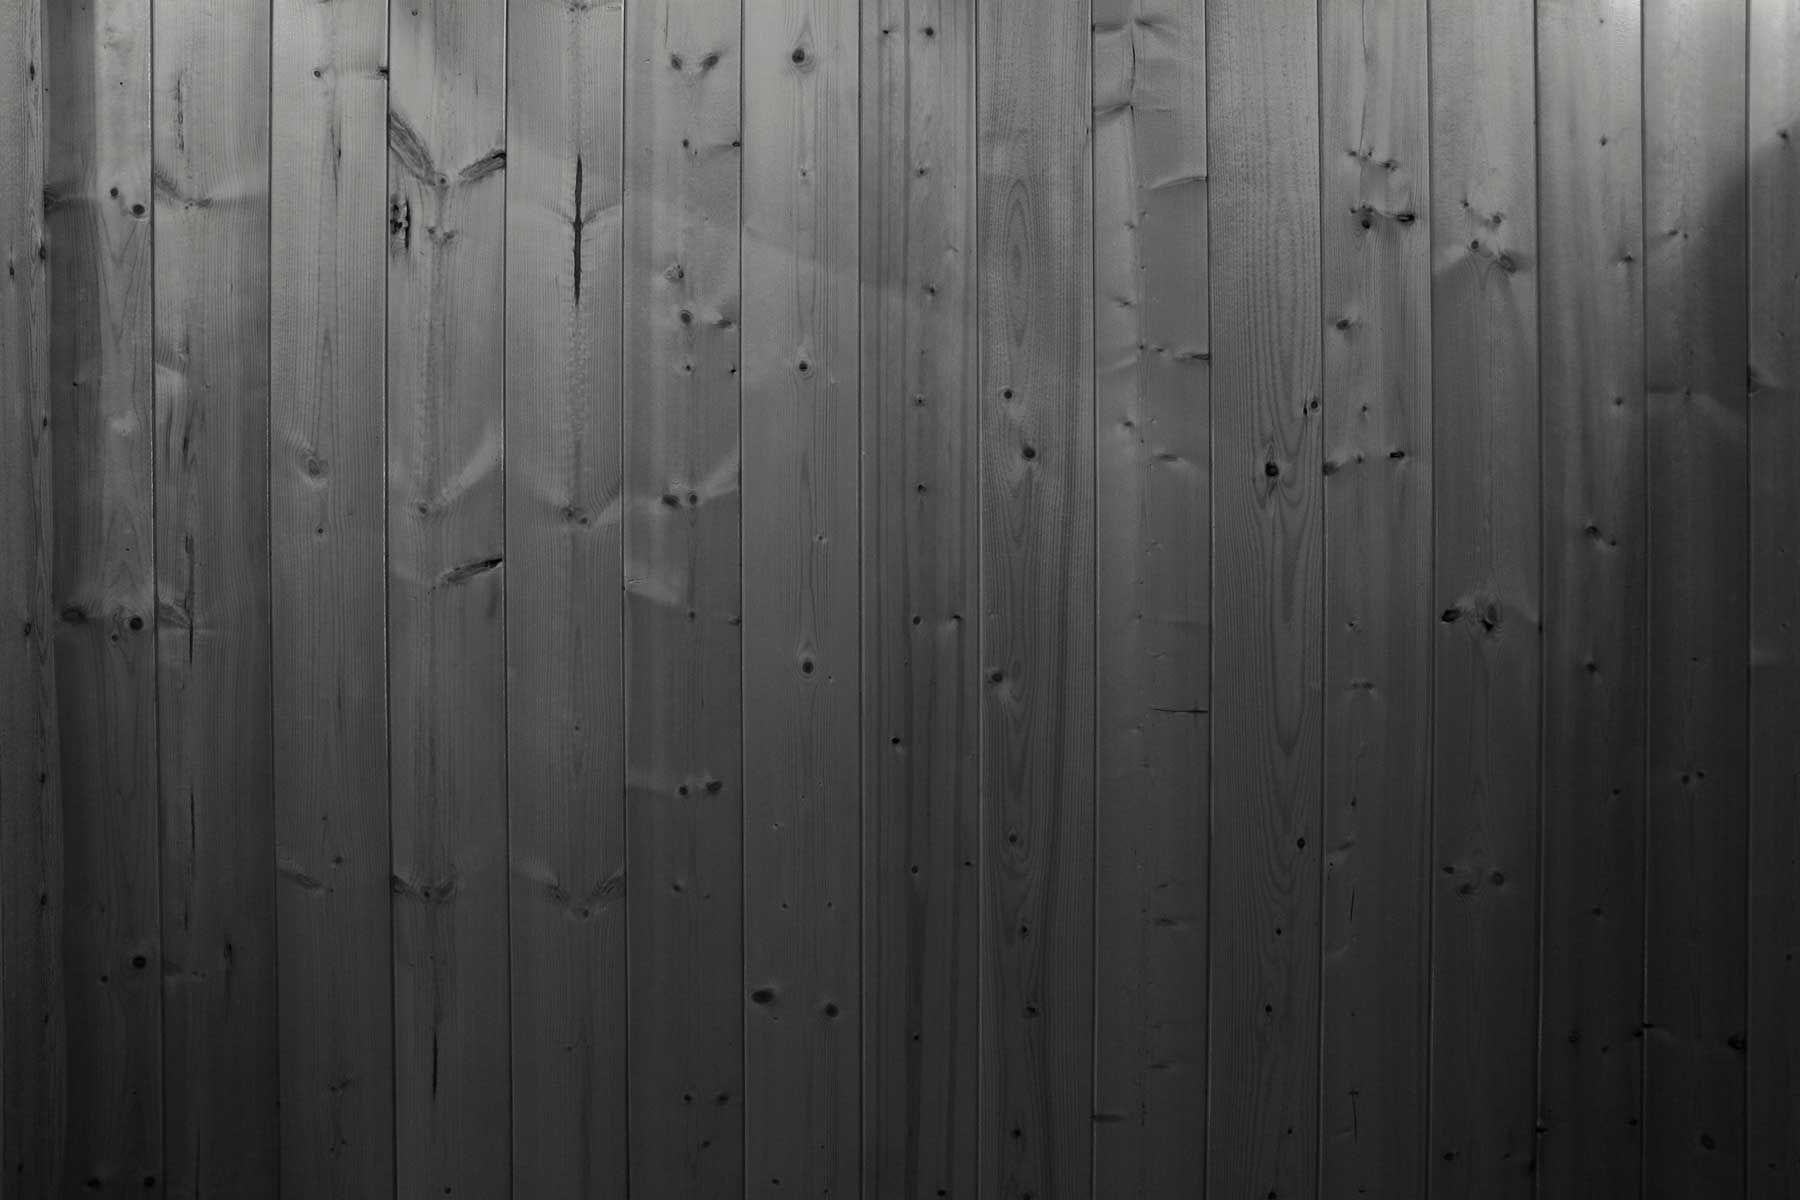 Wood Stain · Black Laminate Flooring ...